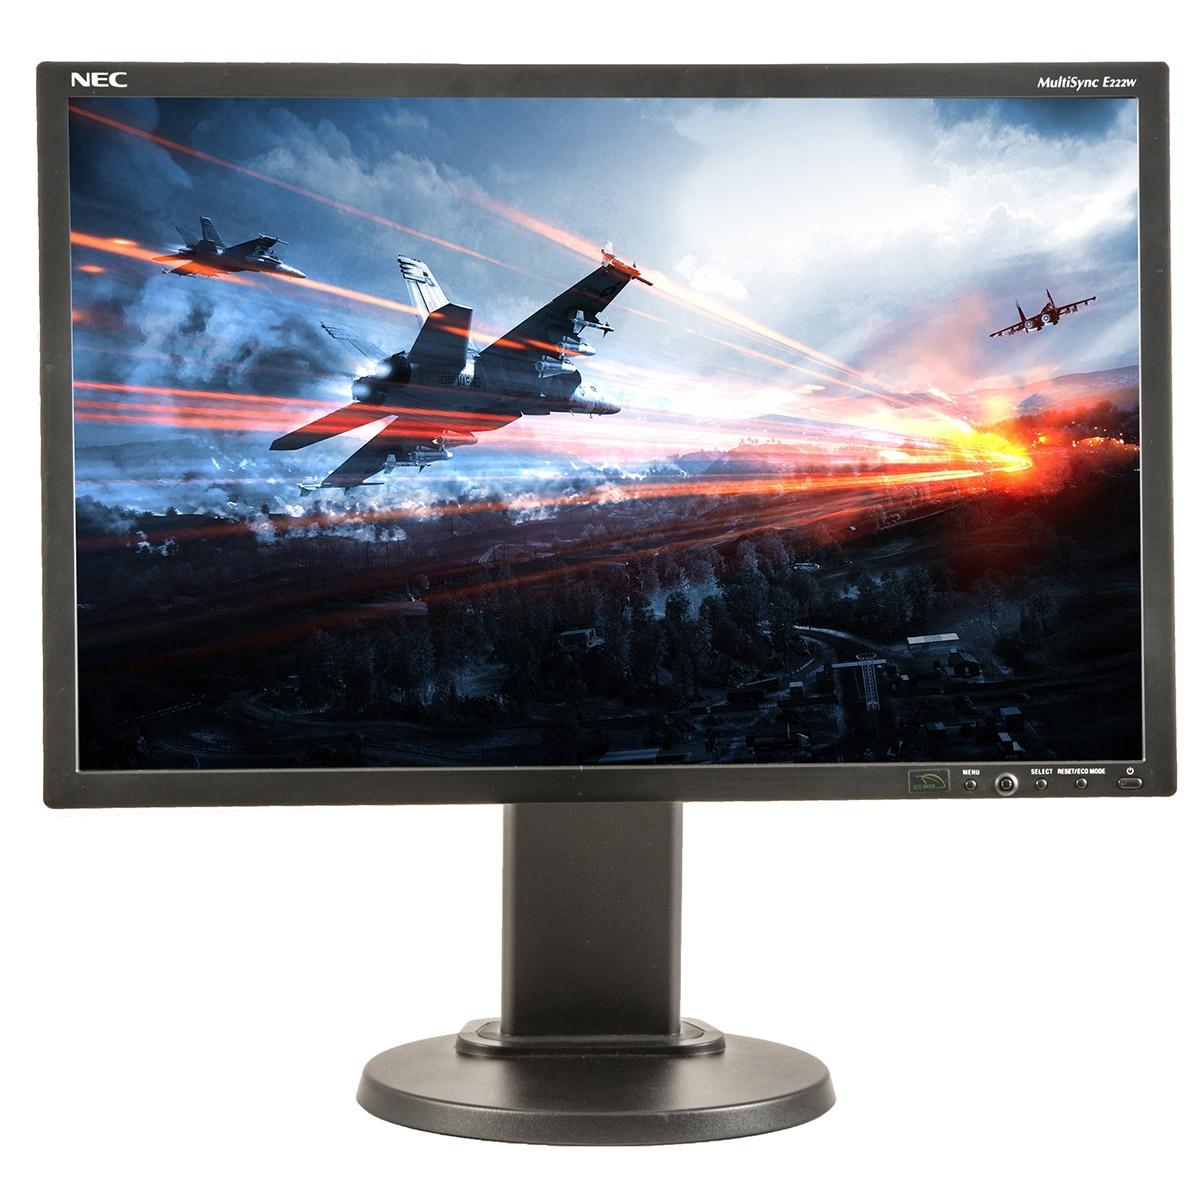 NEC MultiSync E222W  22 inch LCD  1680 x 1050  16:10  negru  monitor refurbished